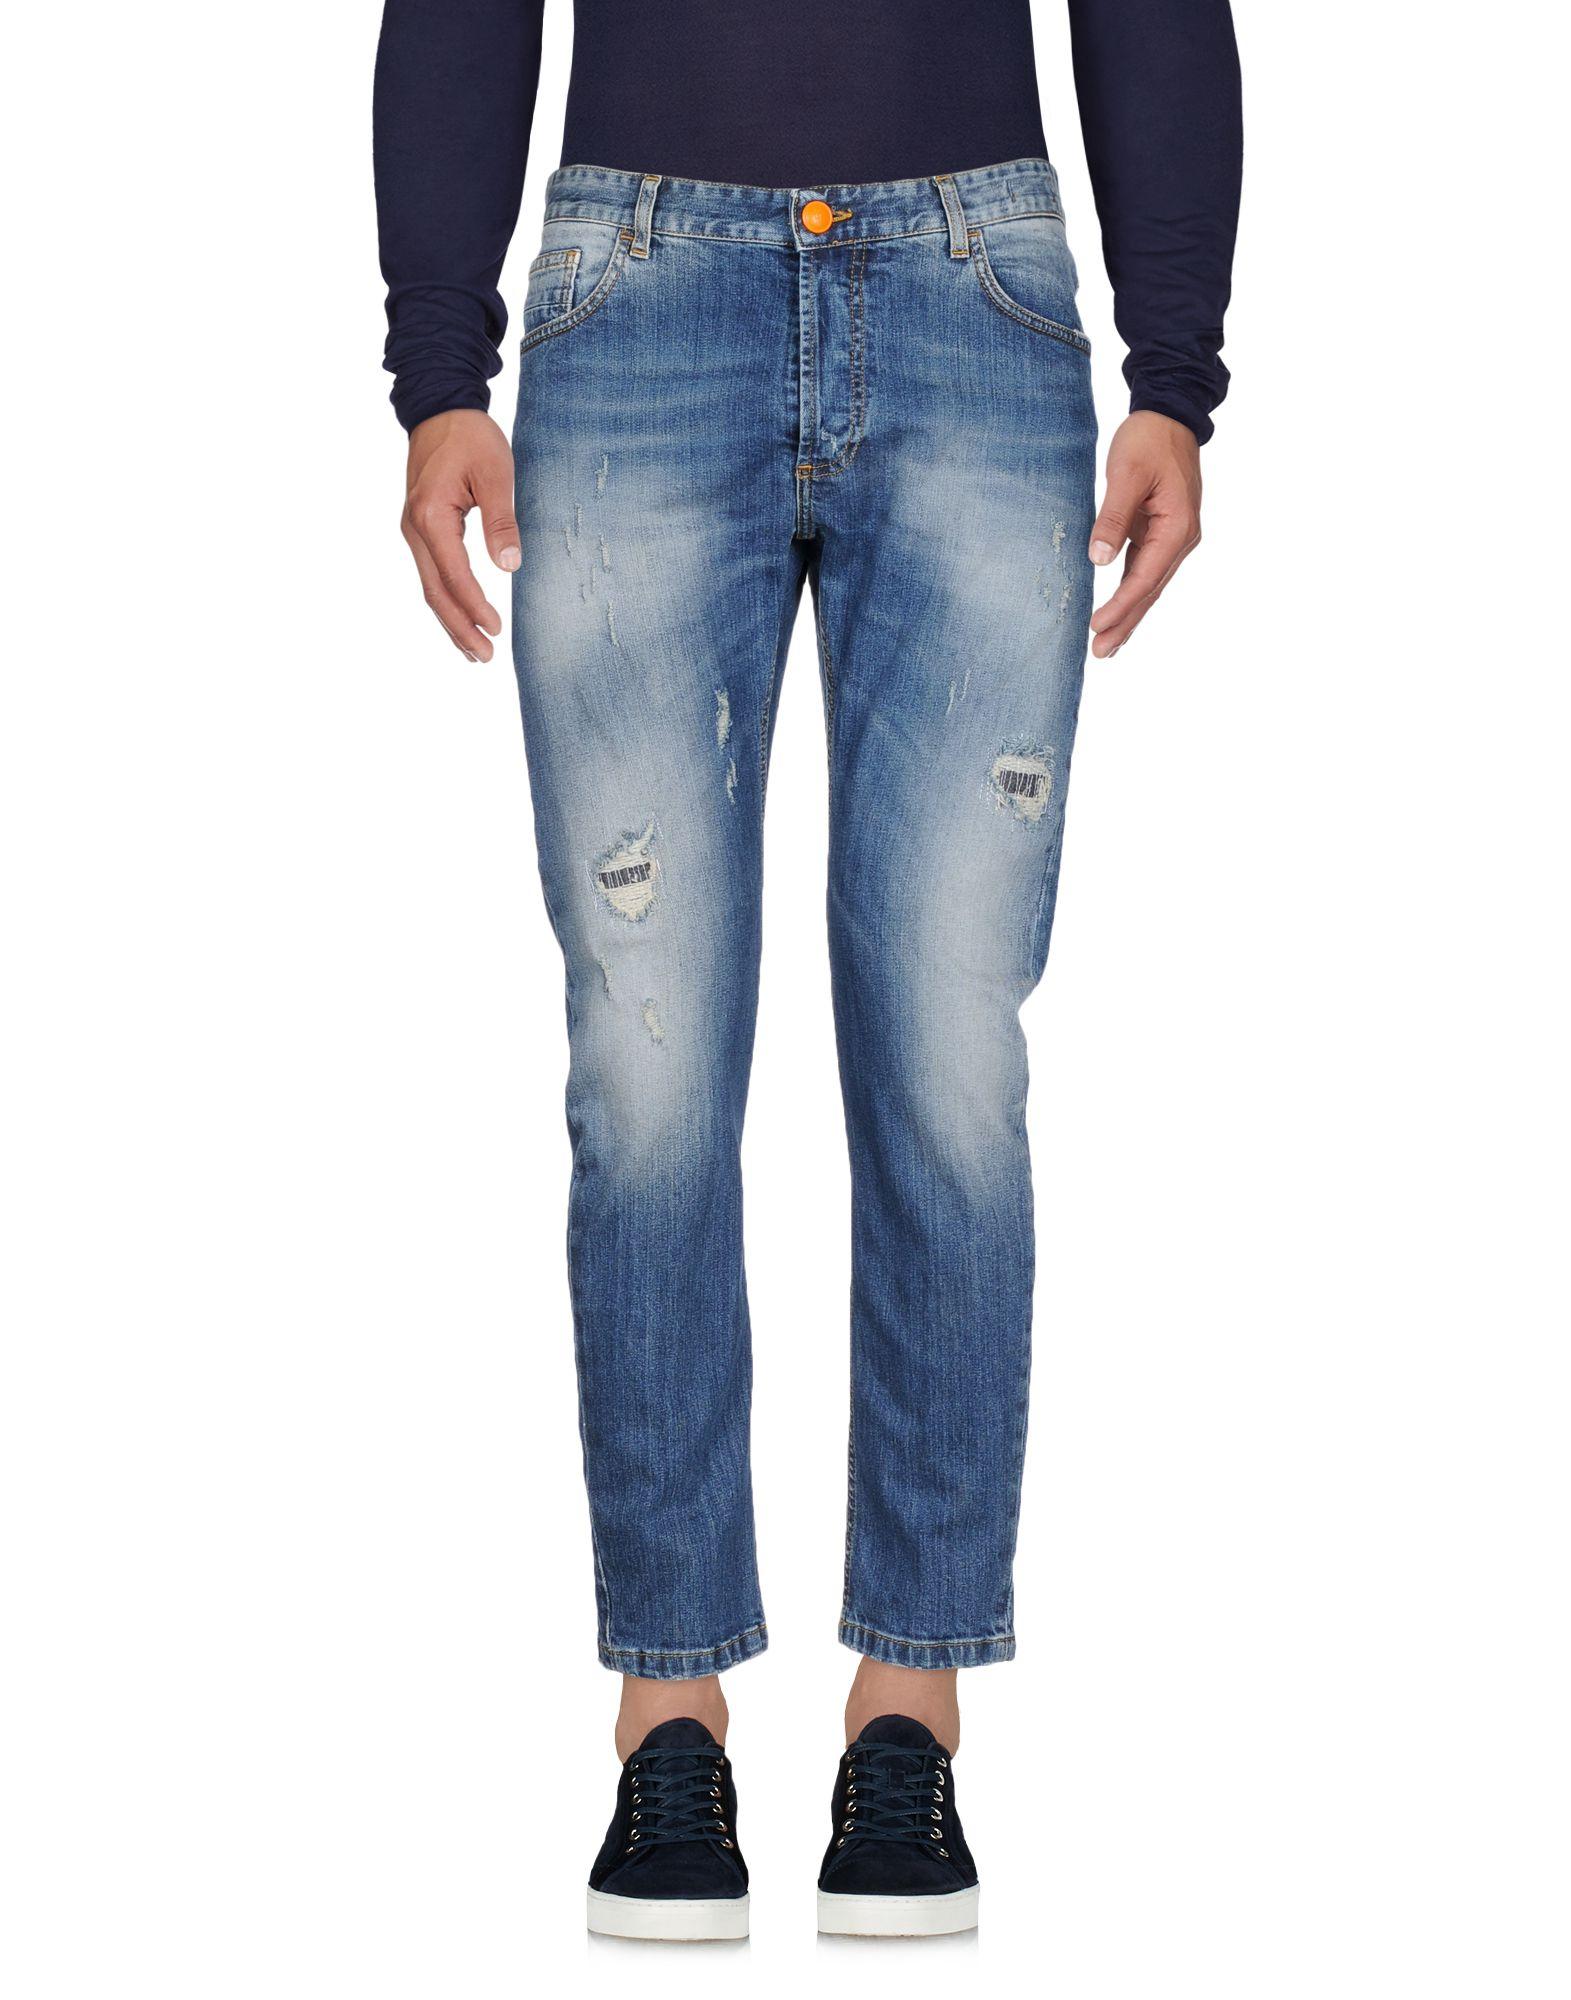 Pantaloni Jeans Gabardine - Uomo - Gabardine 42669144OA 2ca335